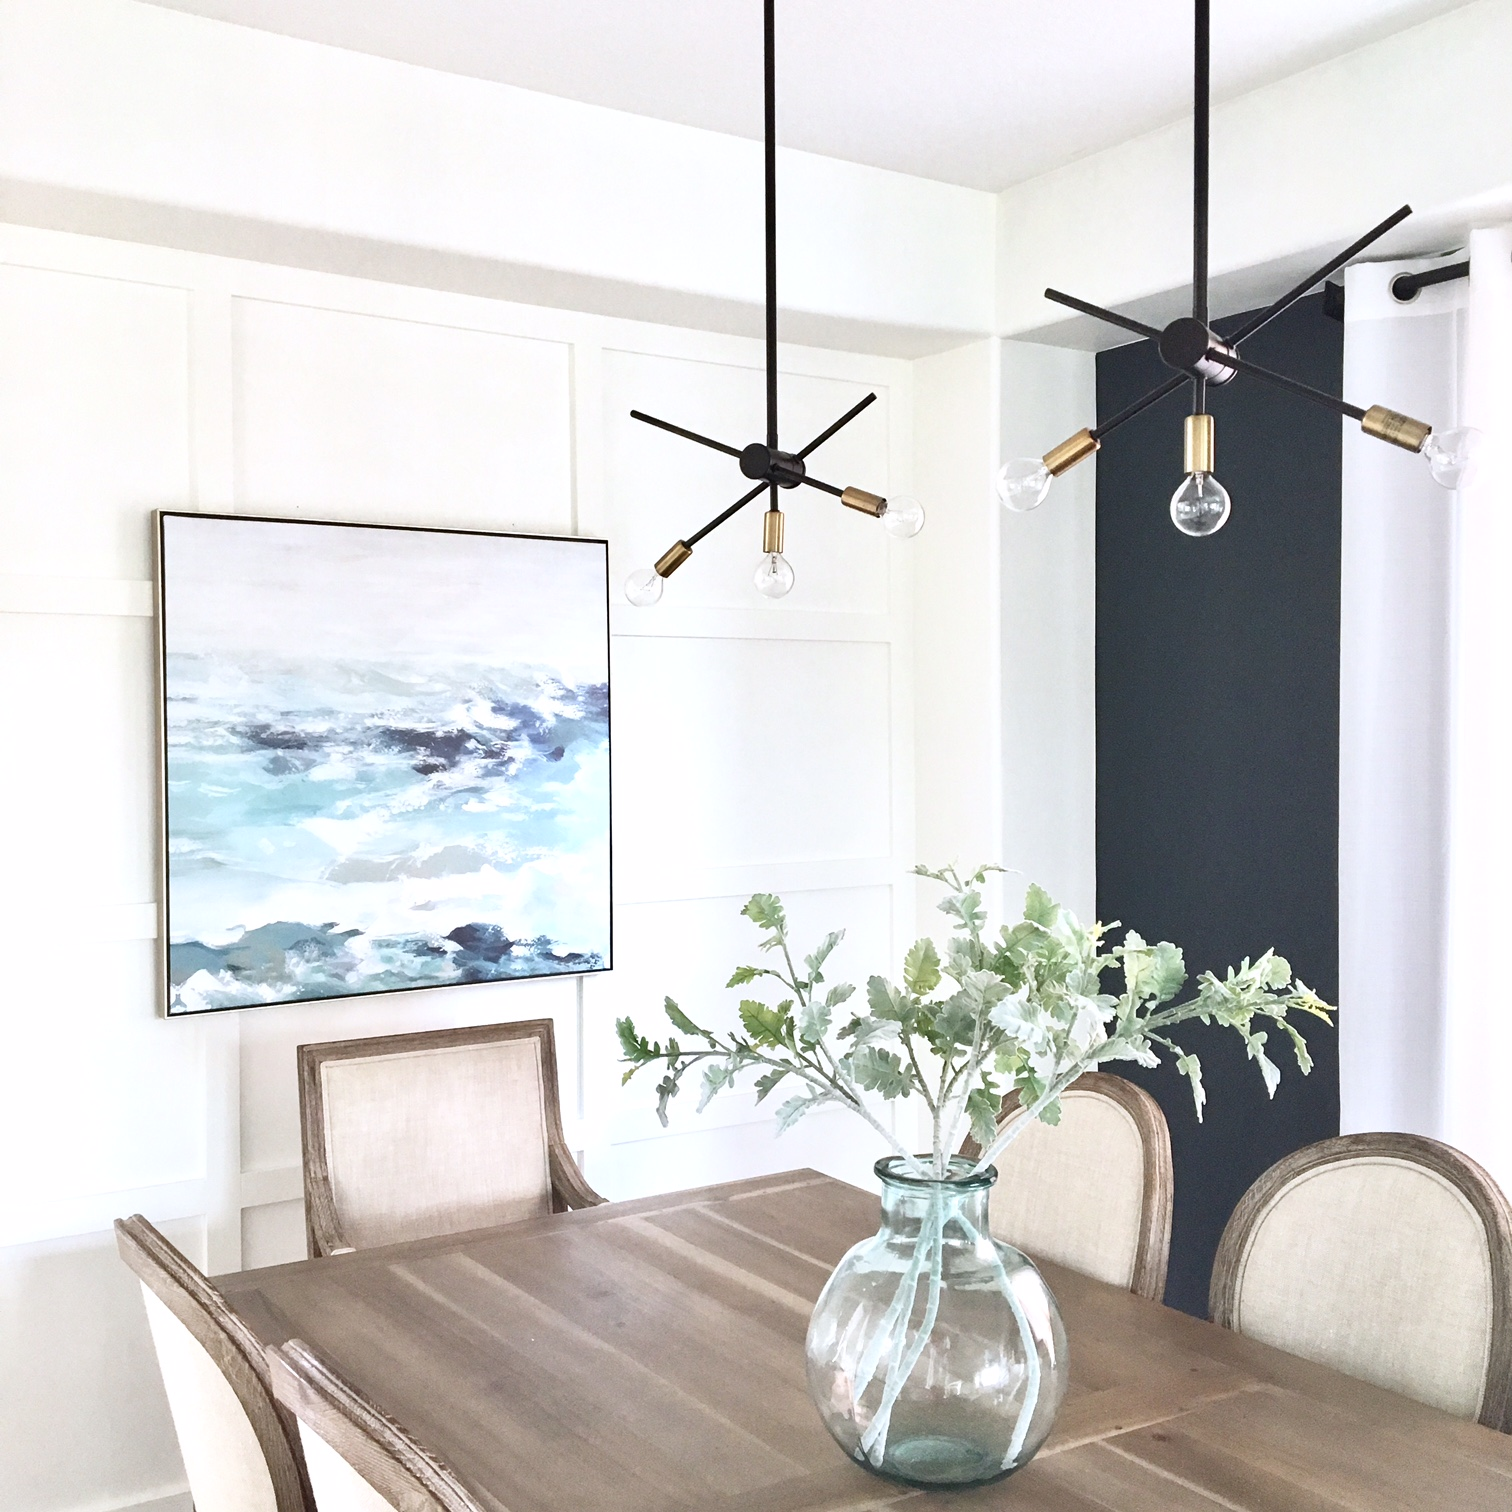 Dining Room Pendant Light Harlow, Wayfair Lighting Fixtures Dining Room